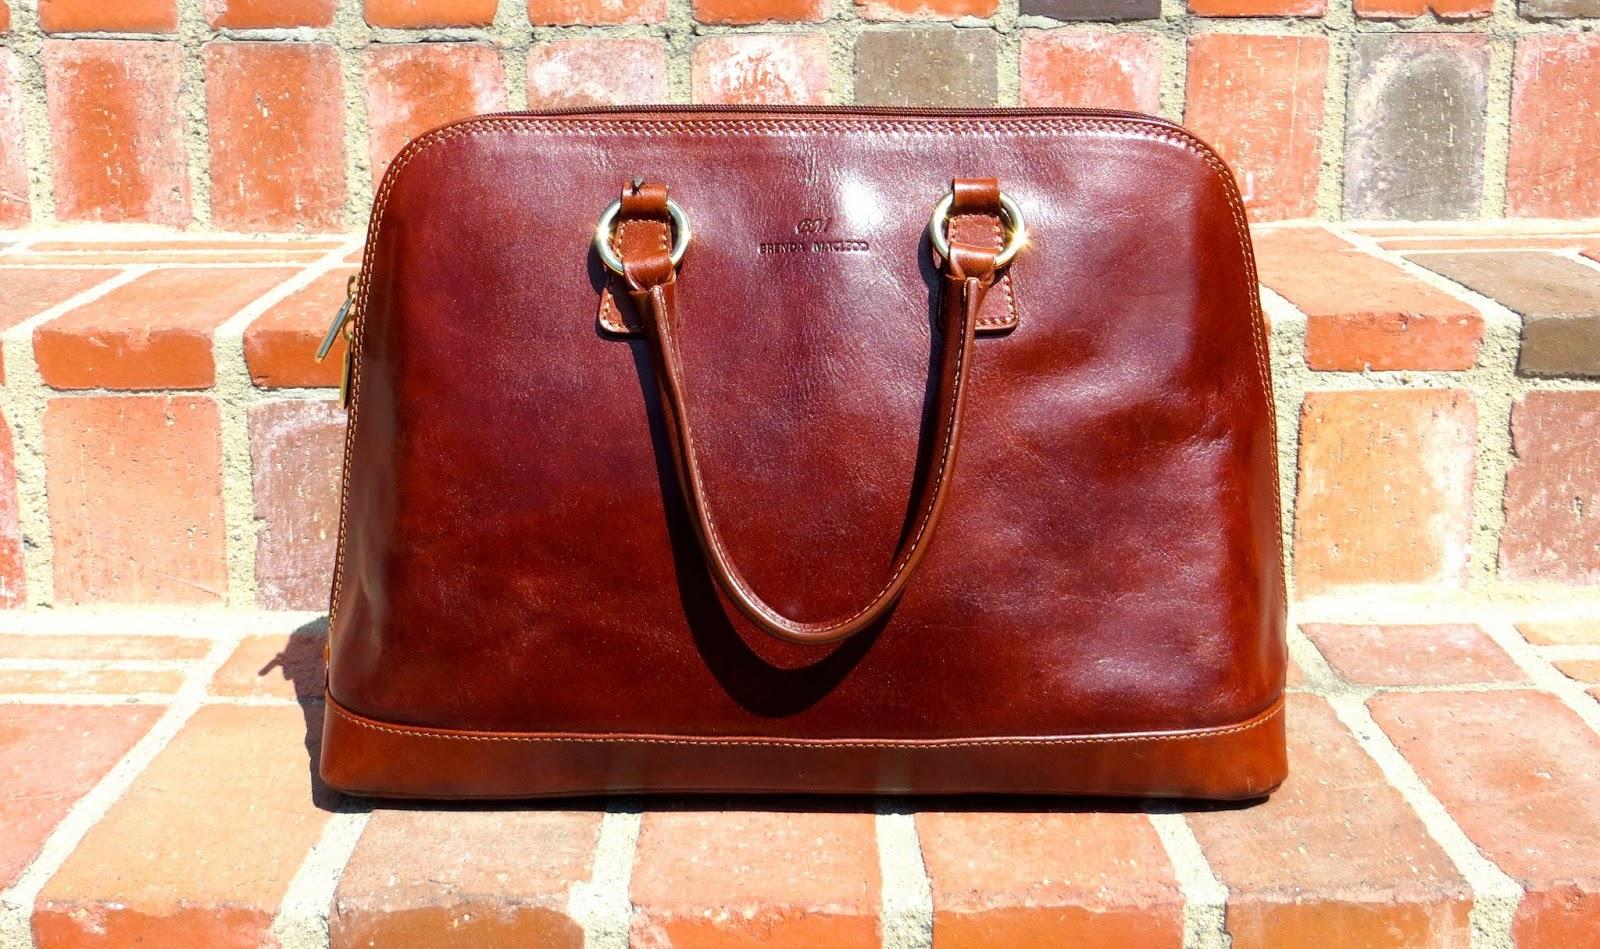 Brenda Macleod Fiona tan front view - Hello, Handbag